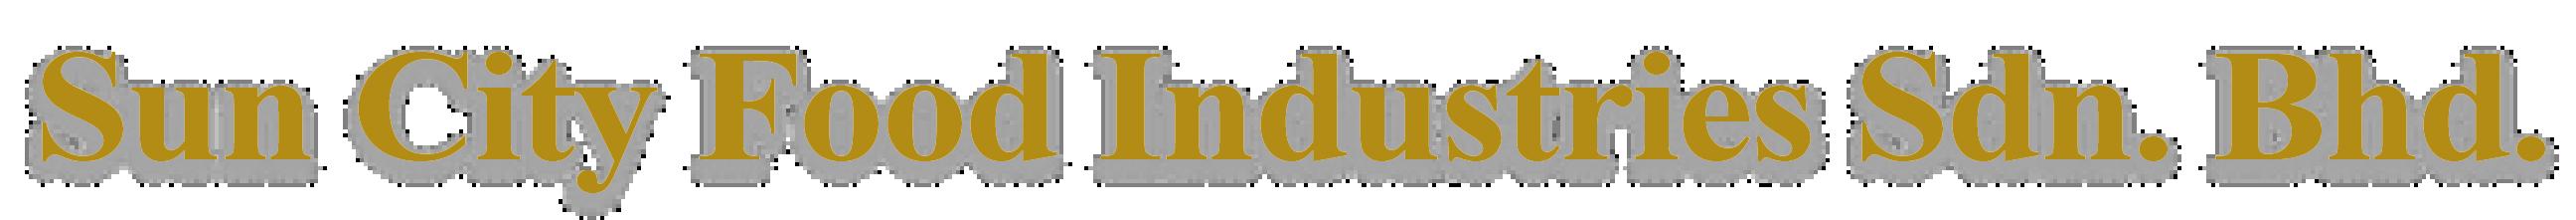 Sun City – Food Industries